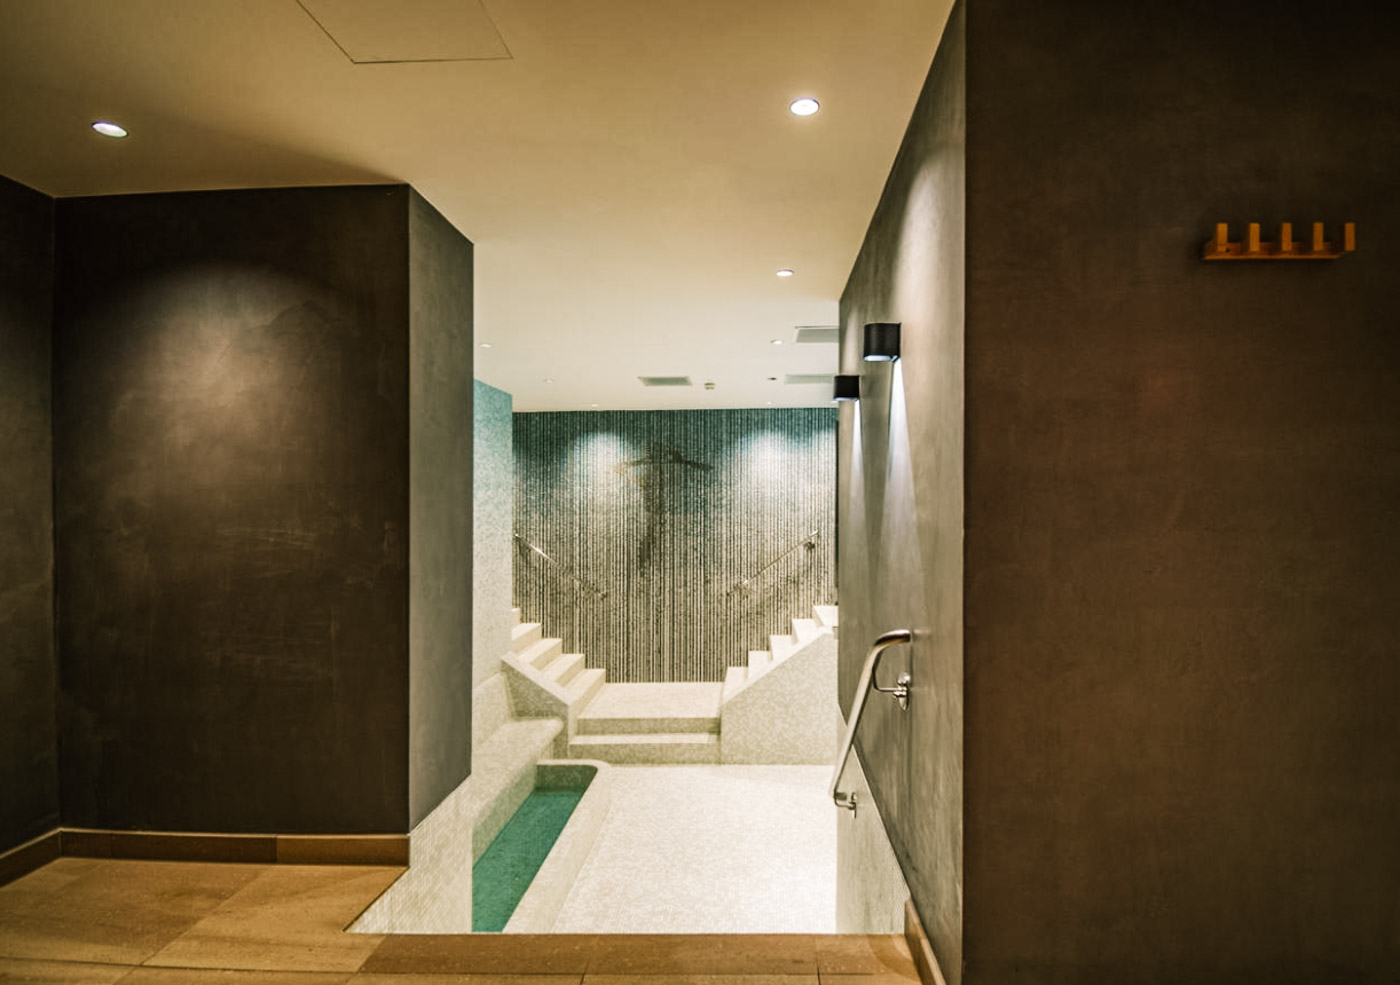 wellness hotel nederland tips bussloo